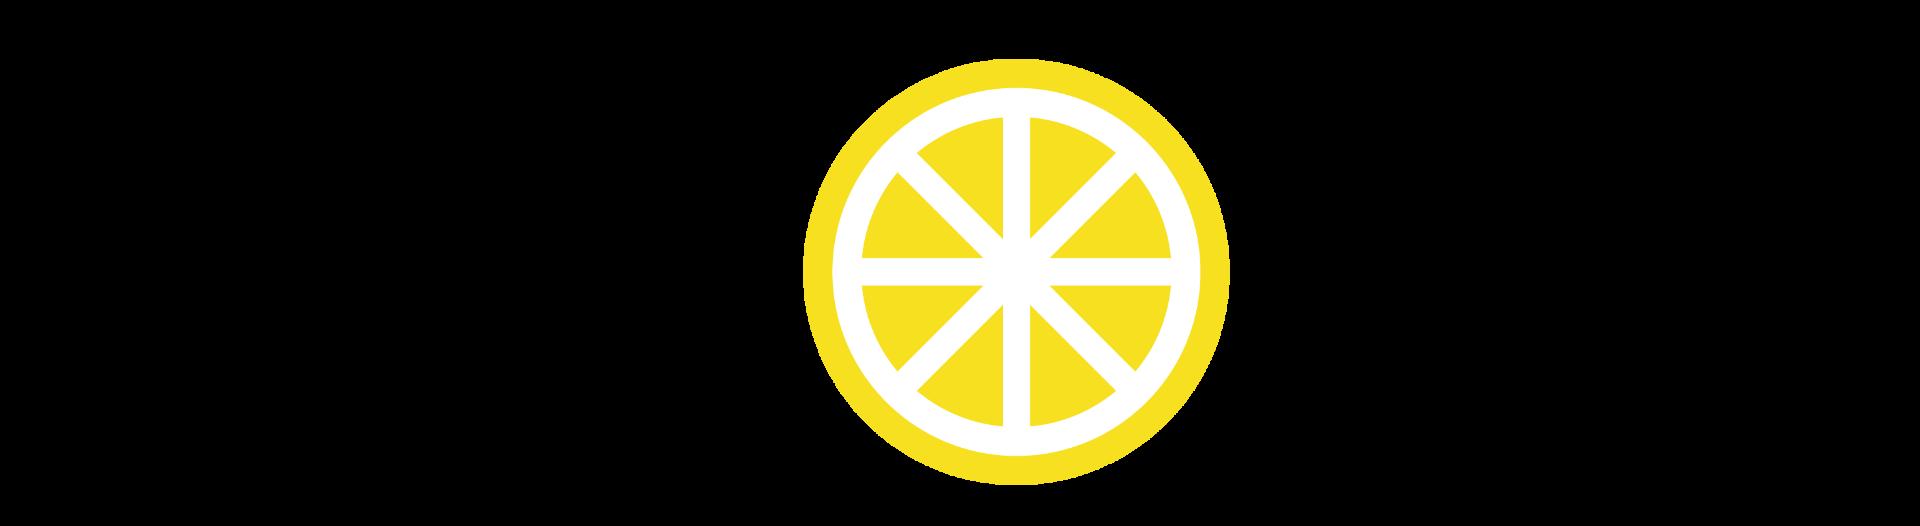 TIENDALIMONA